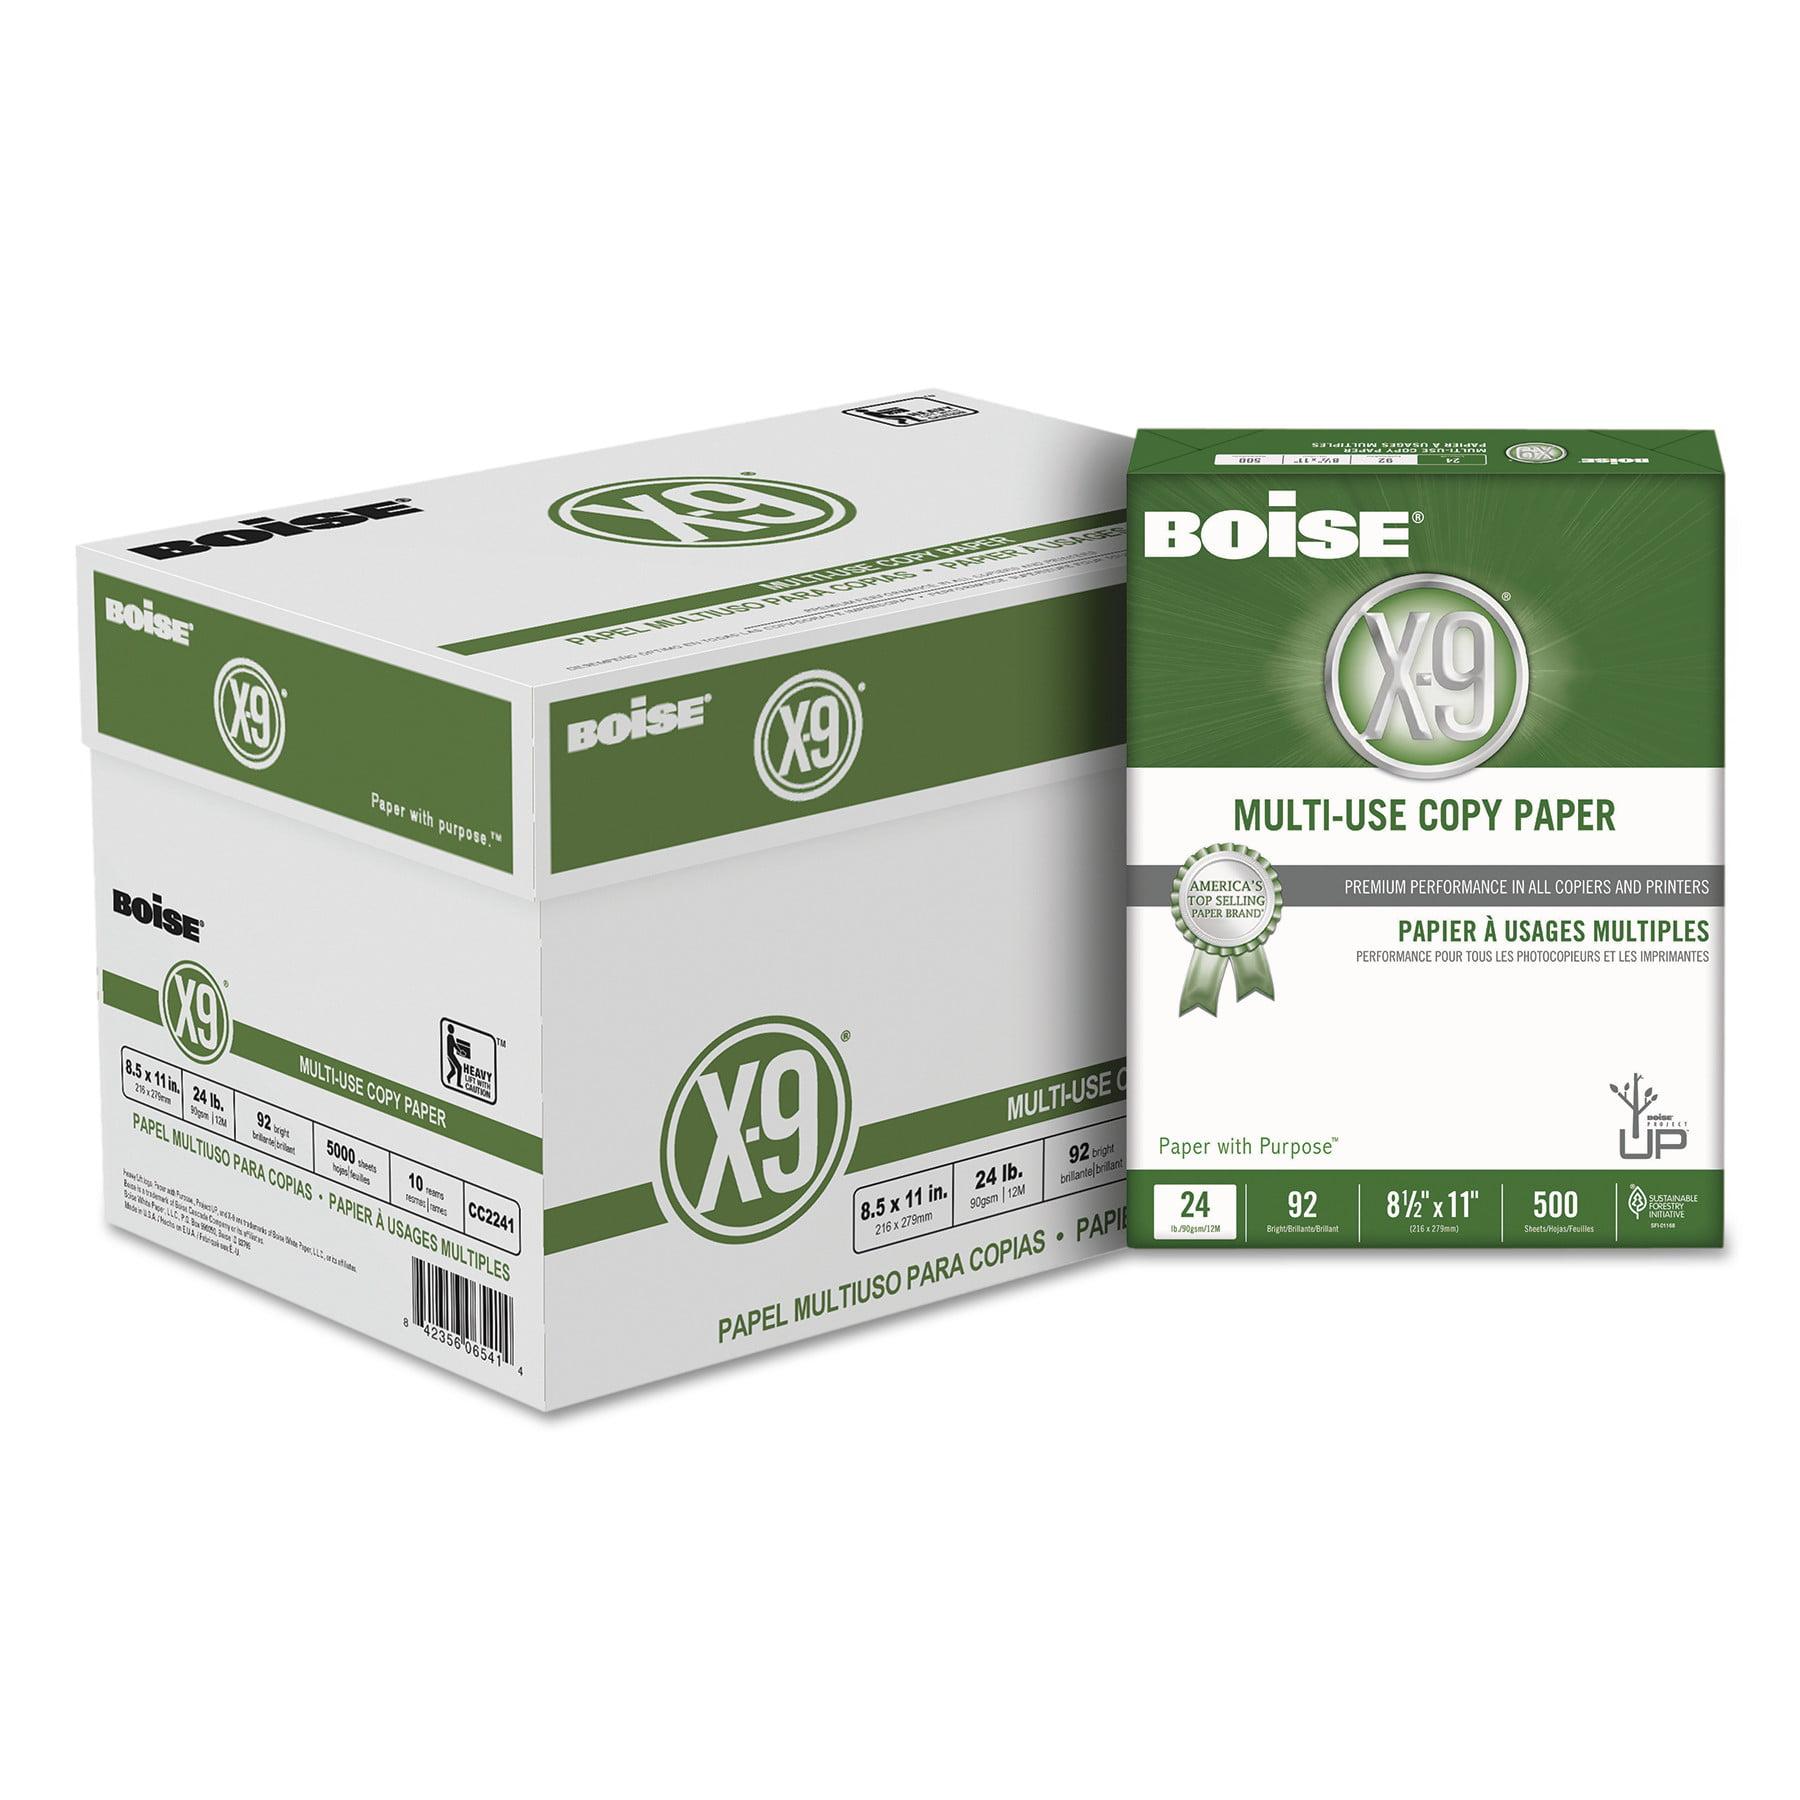 Boise X-9 Multi-Use Copy Paper, 24lb, 8 1/2 x 11, White, 500/Ream, 10 Reams/Carton